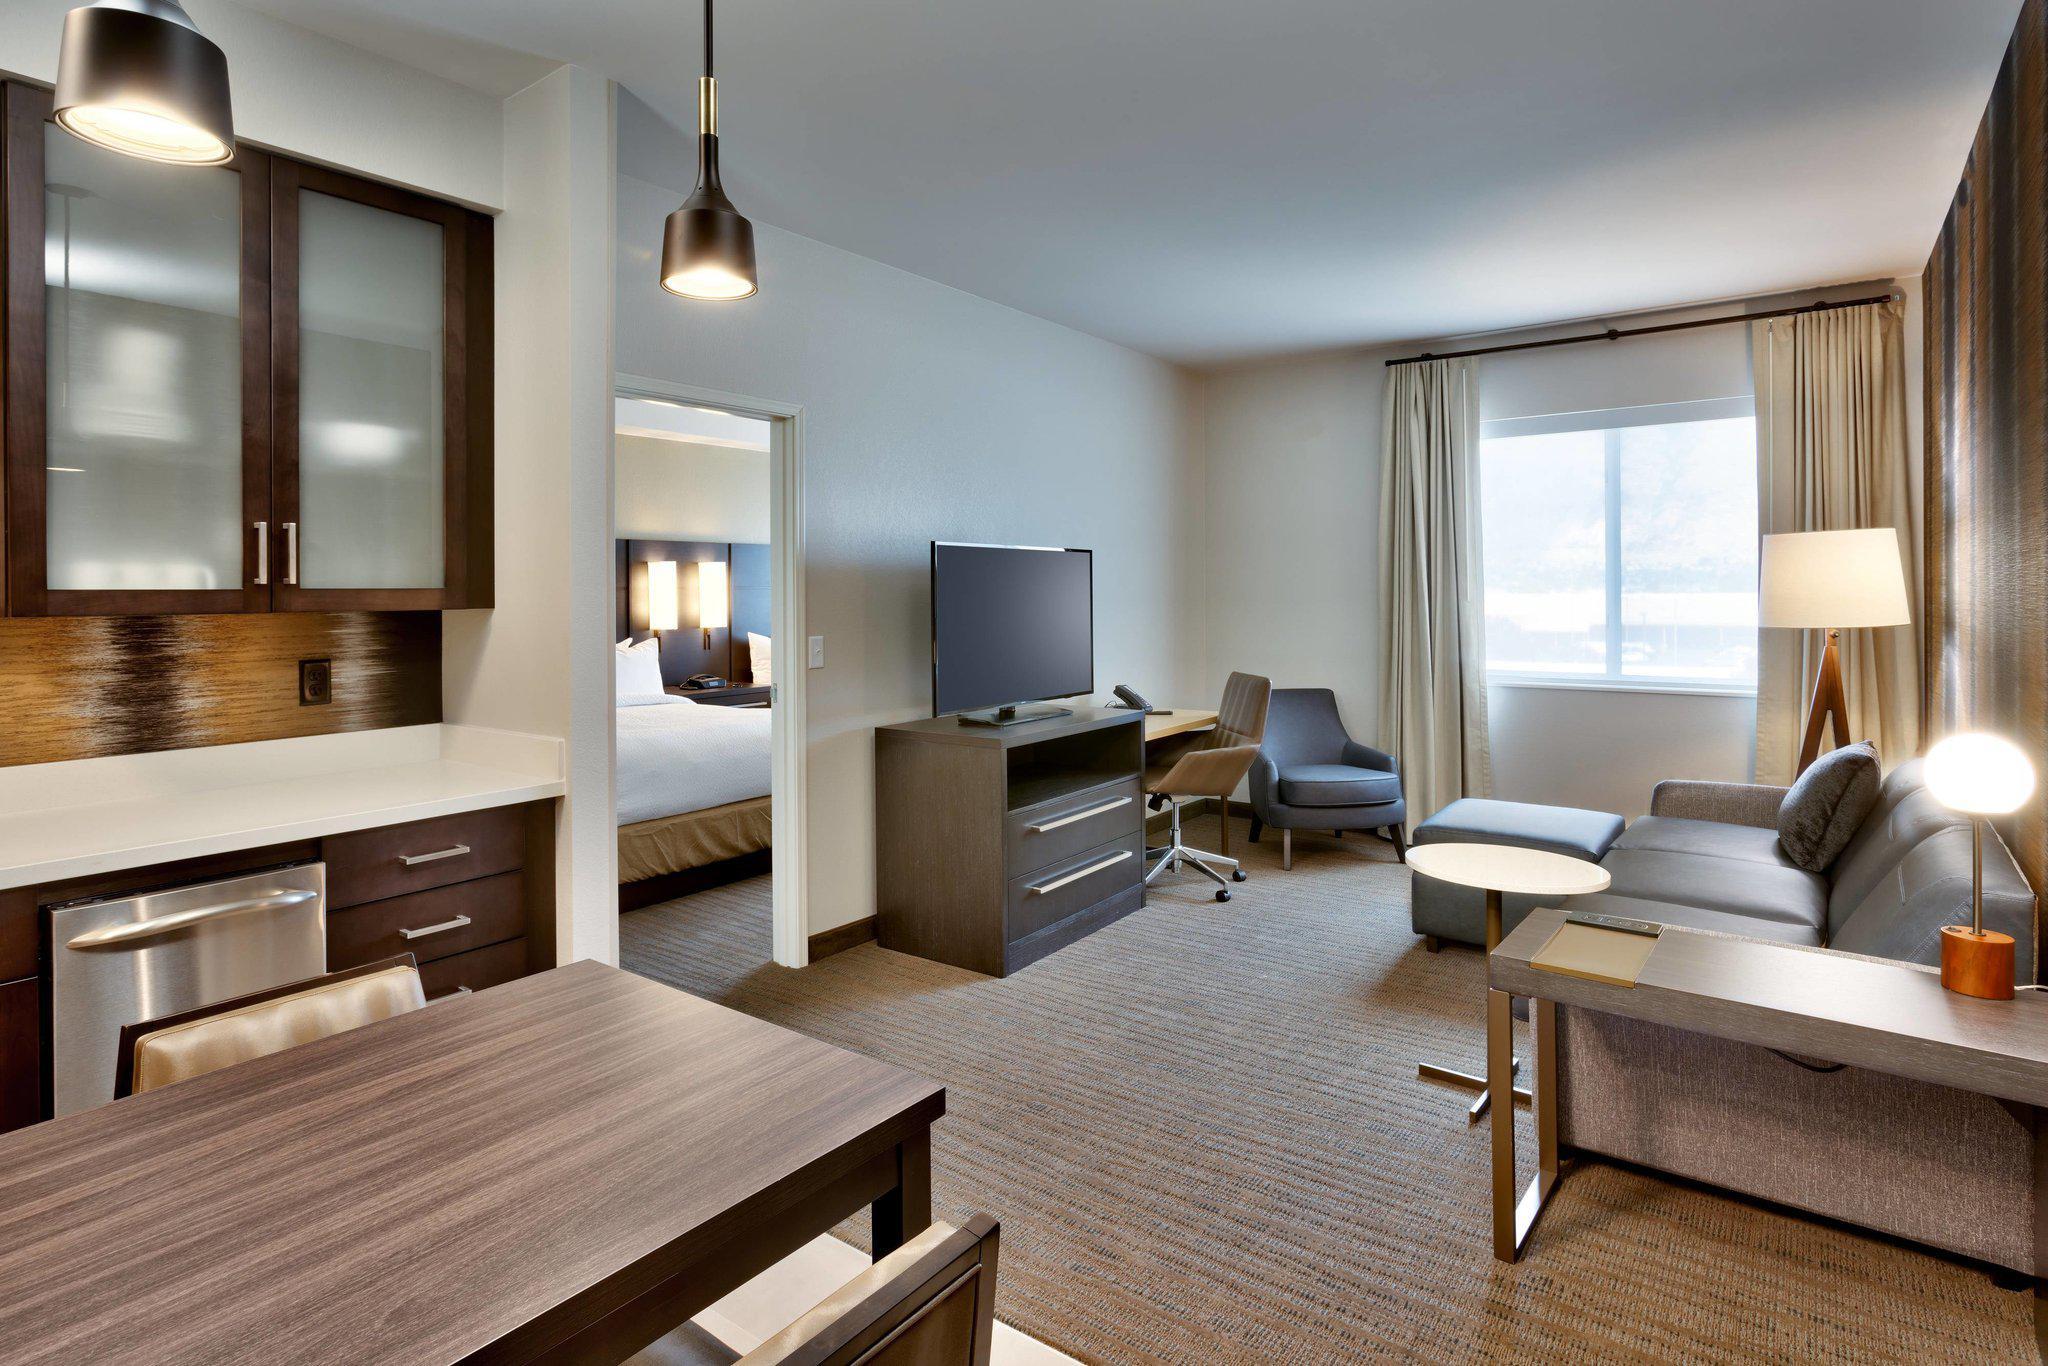 Residence Inn by Marriott Provo South University